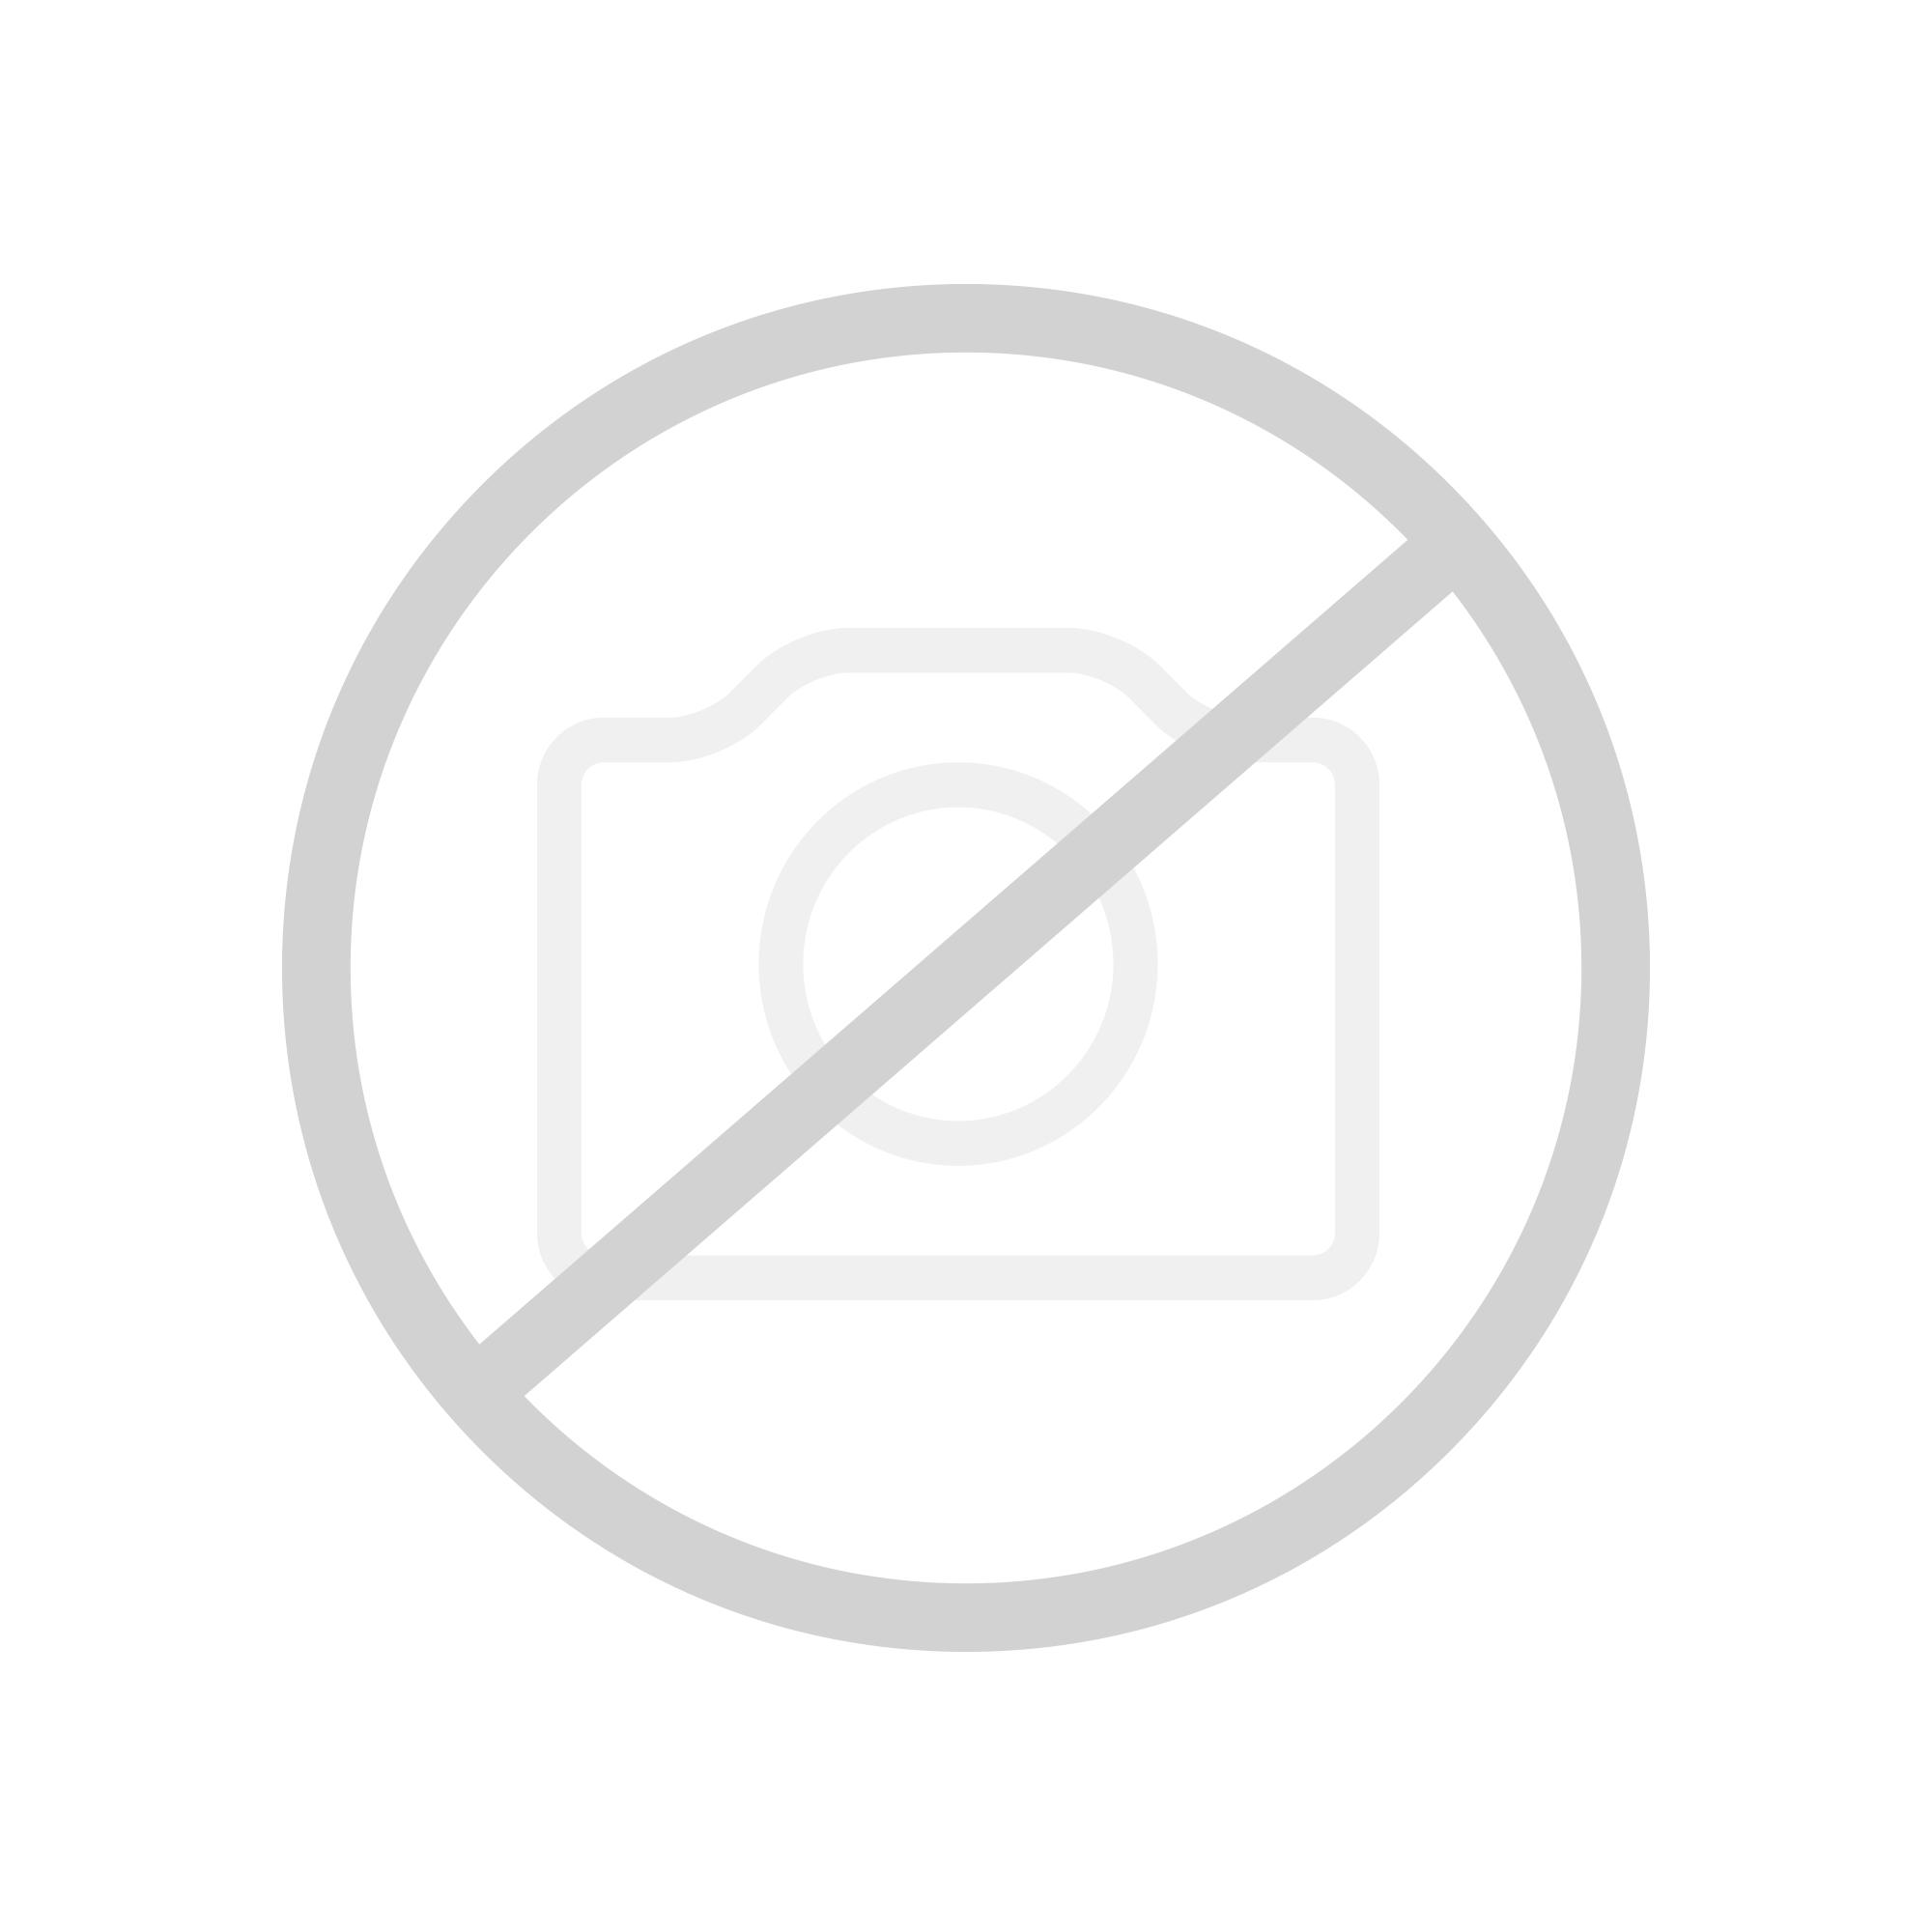 Riho Yukon Easypool Raumspar-Whirlpool mit elektronischer Bedienung, Ausführung links